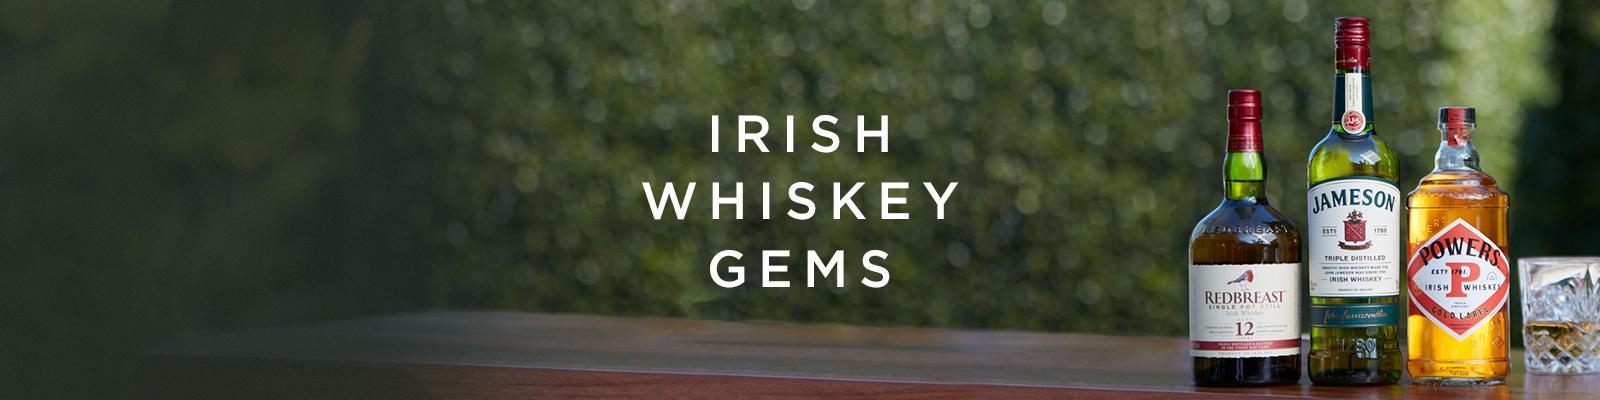 Irish Whiskey Gems